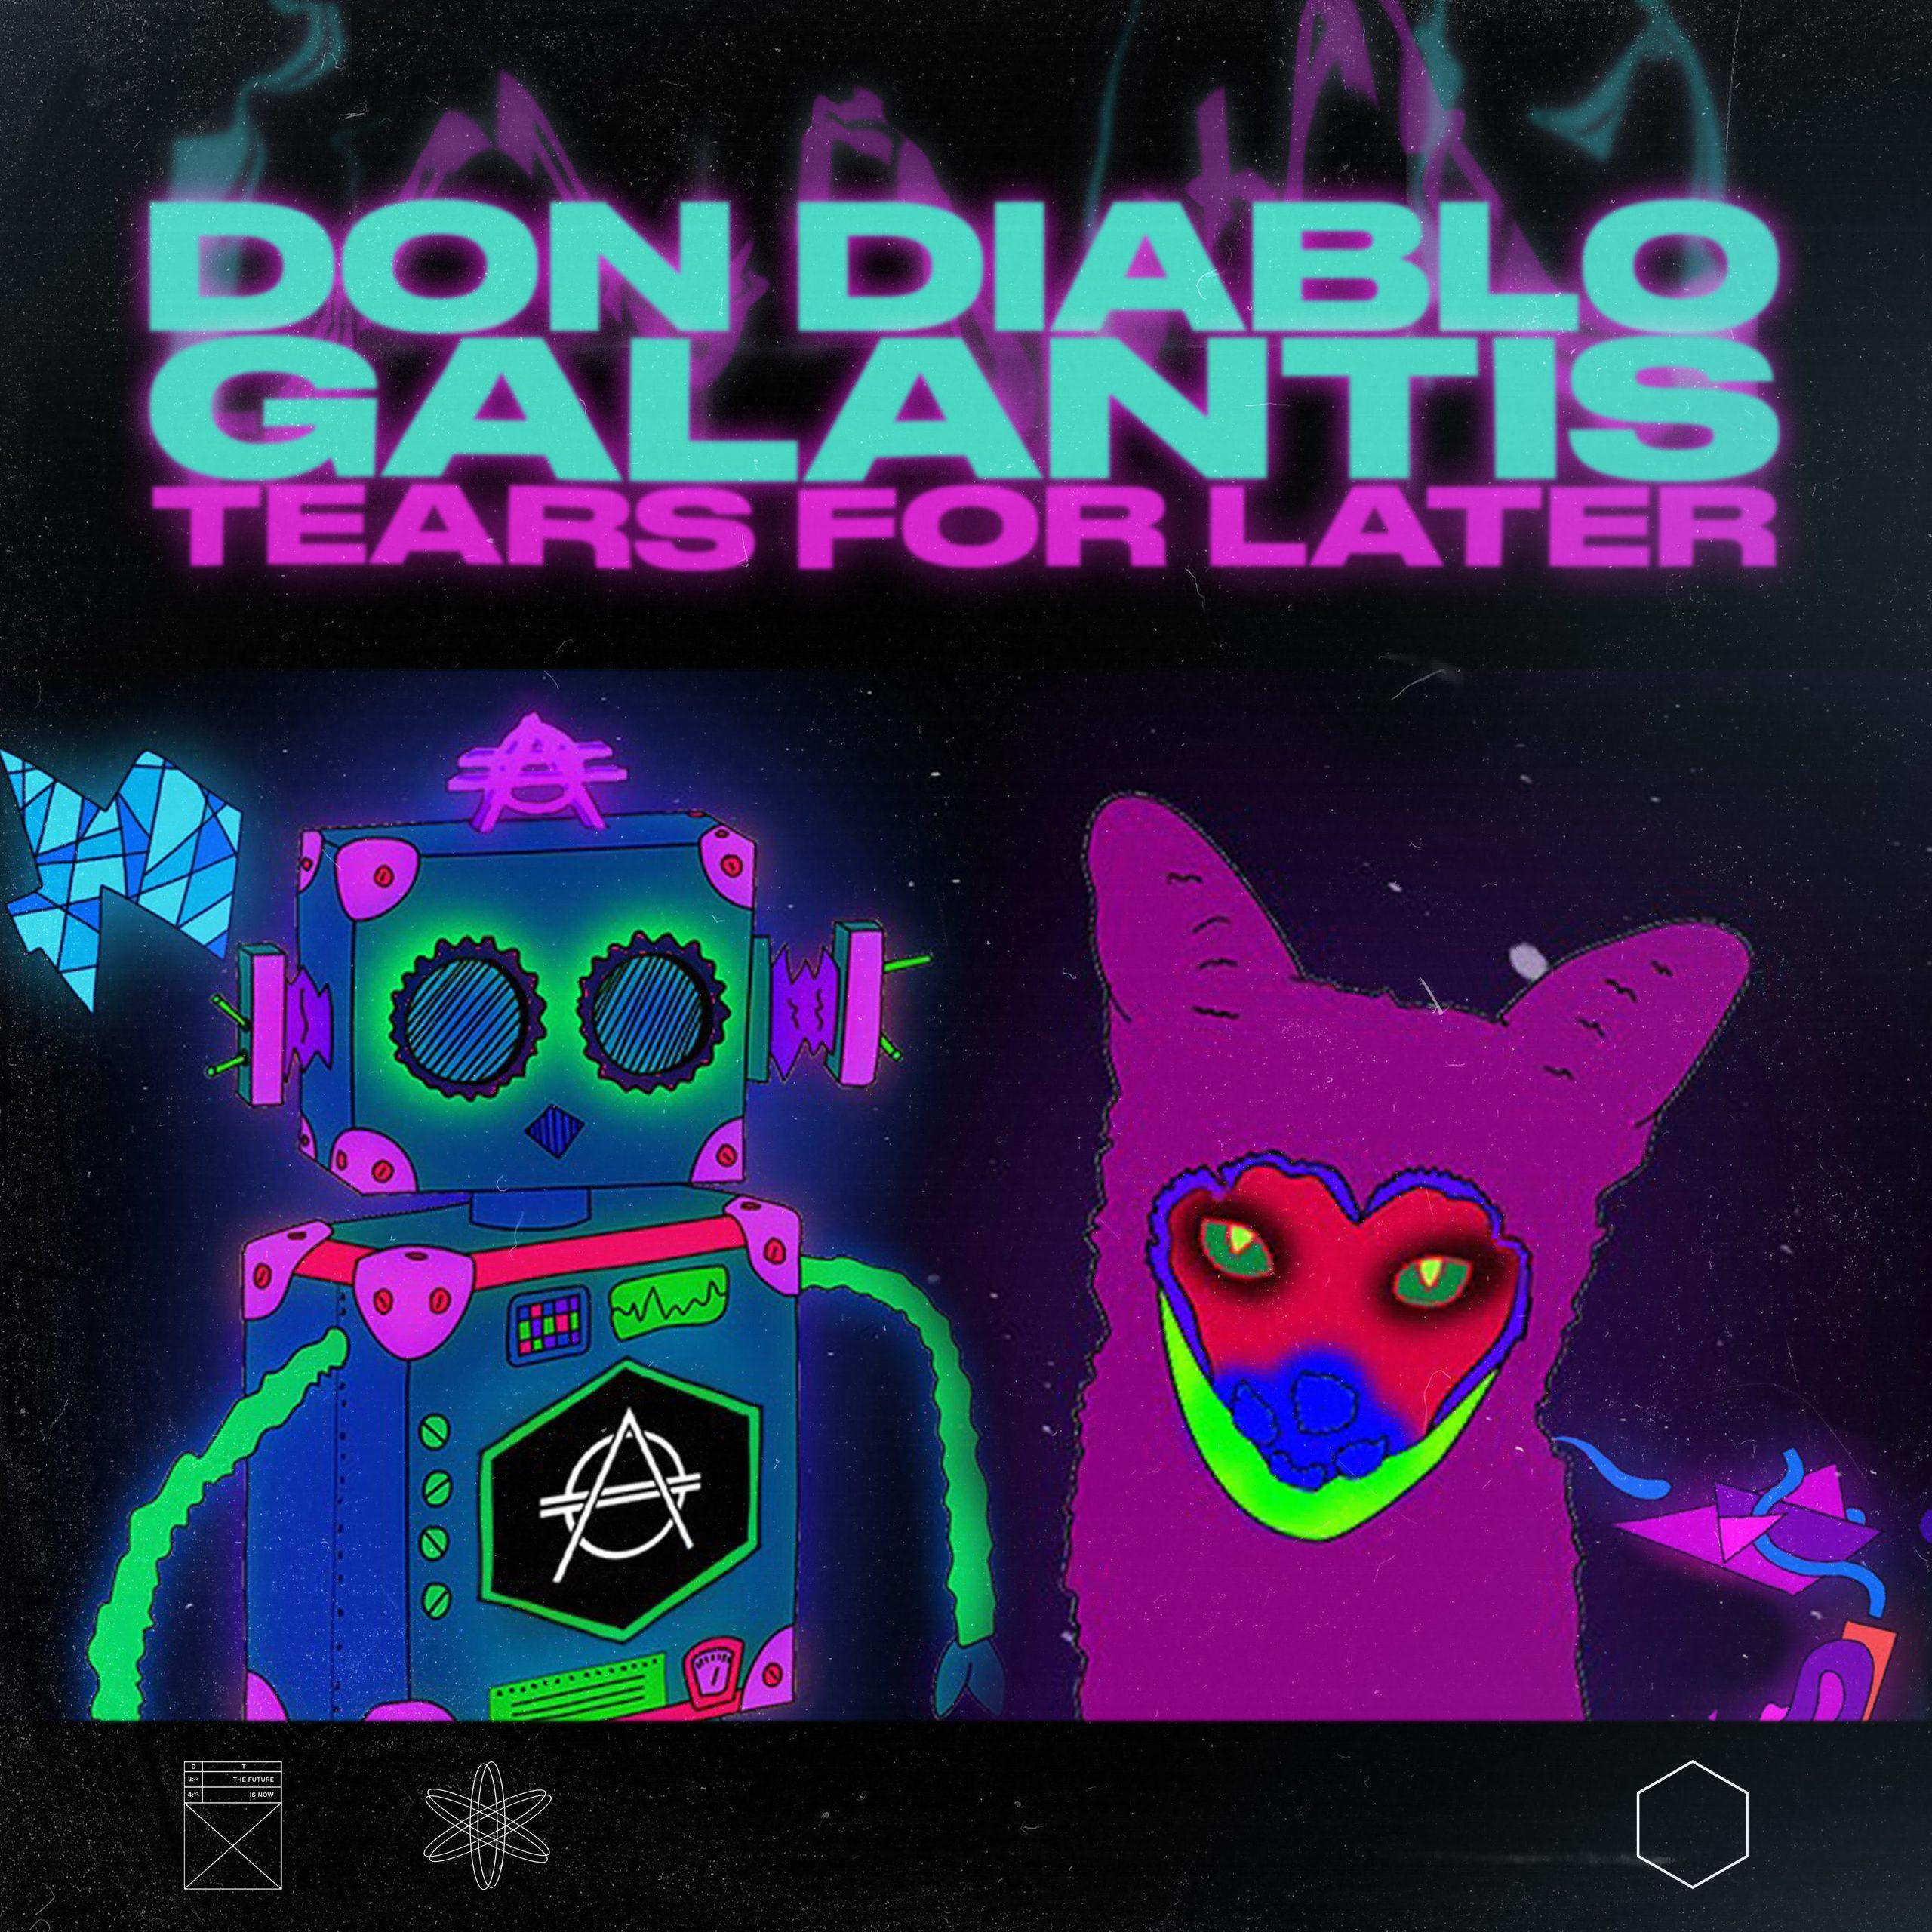 Don Diablo Galantis Tears For Later